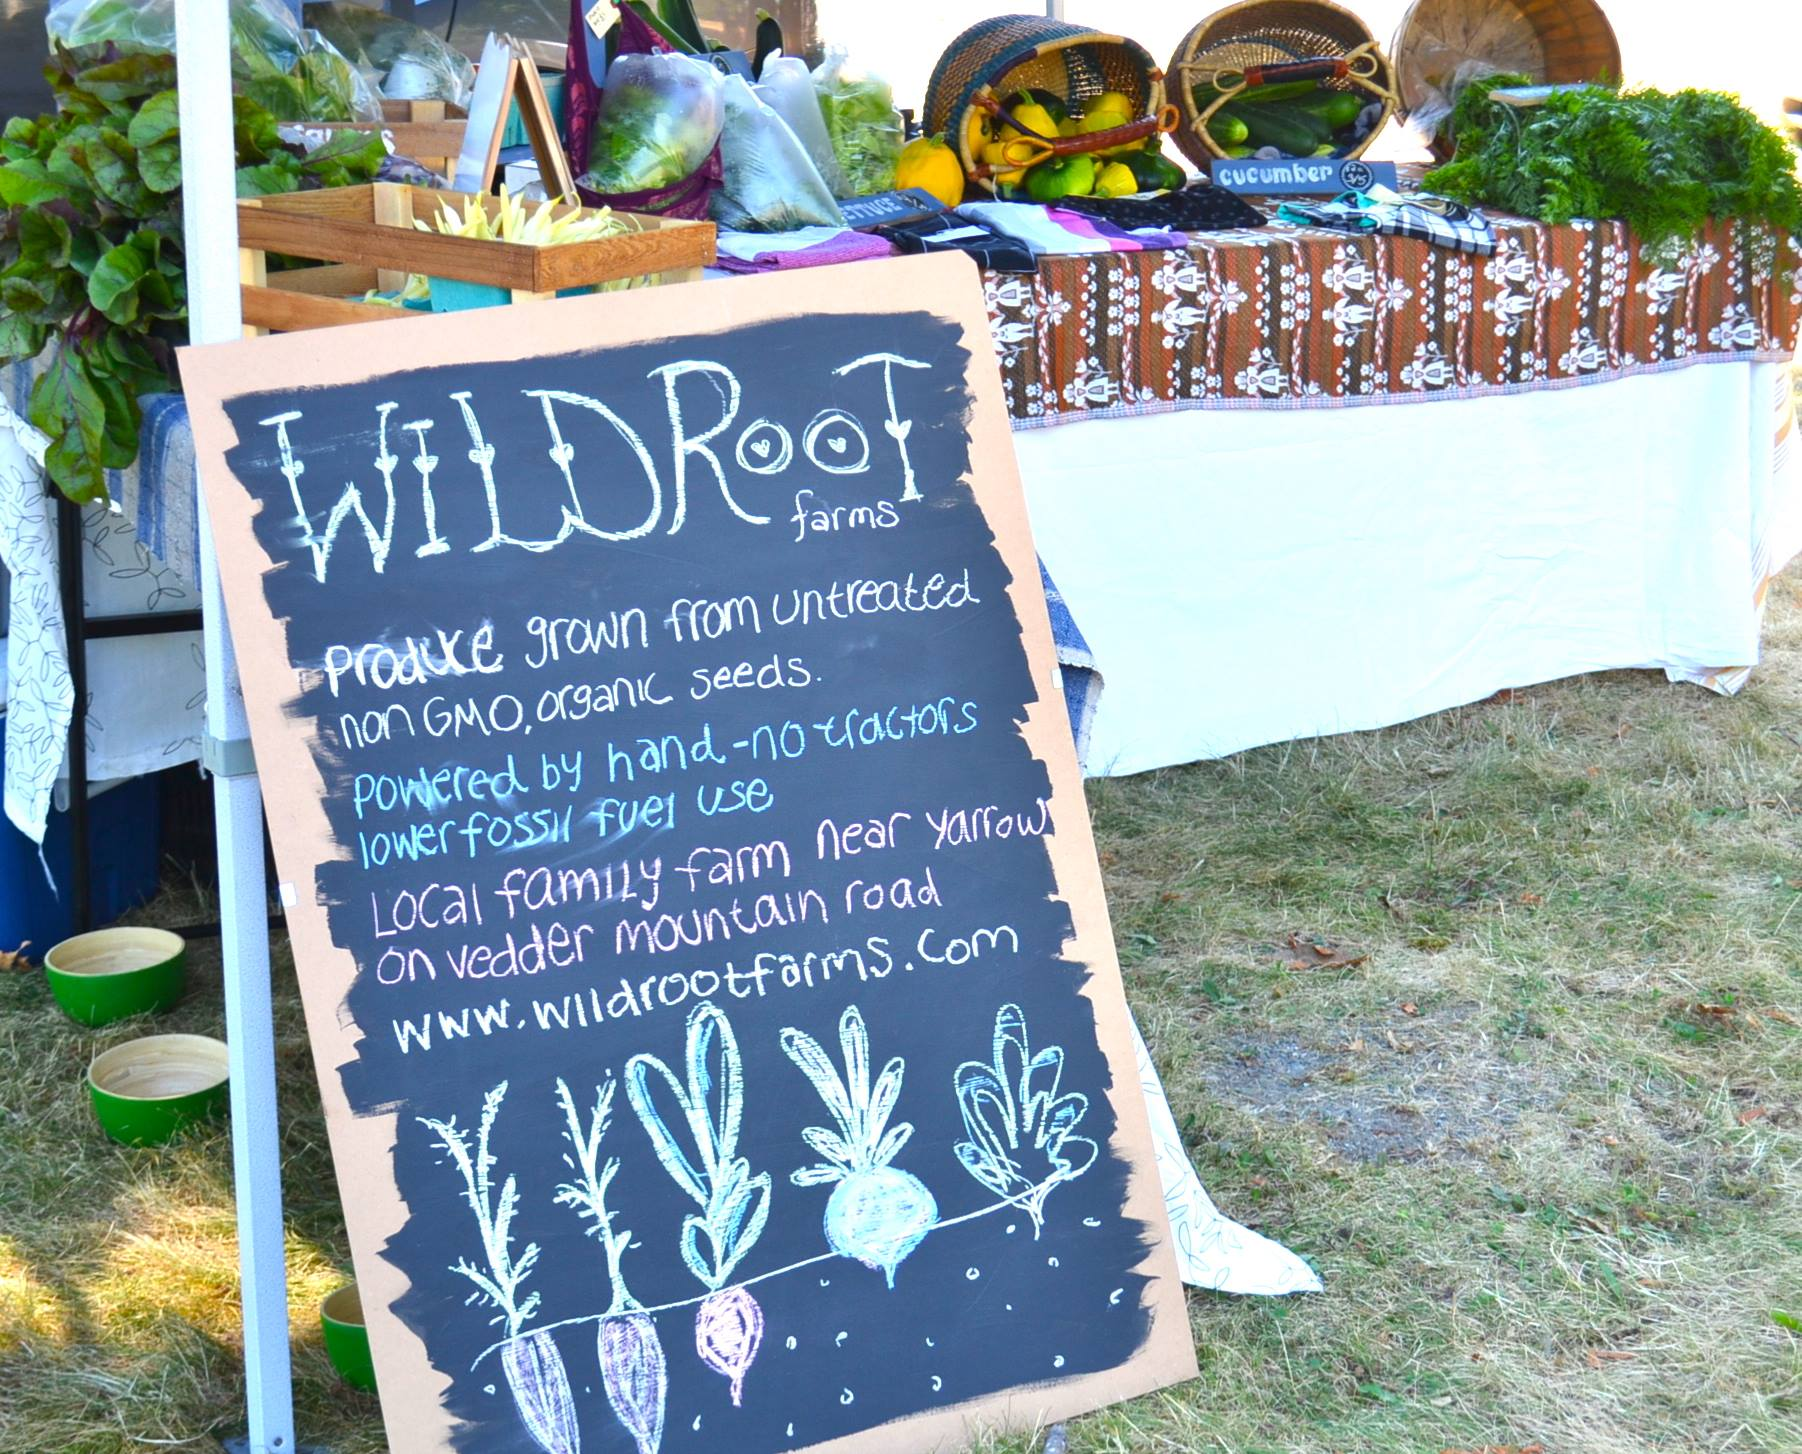 wildrootfarms sign